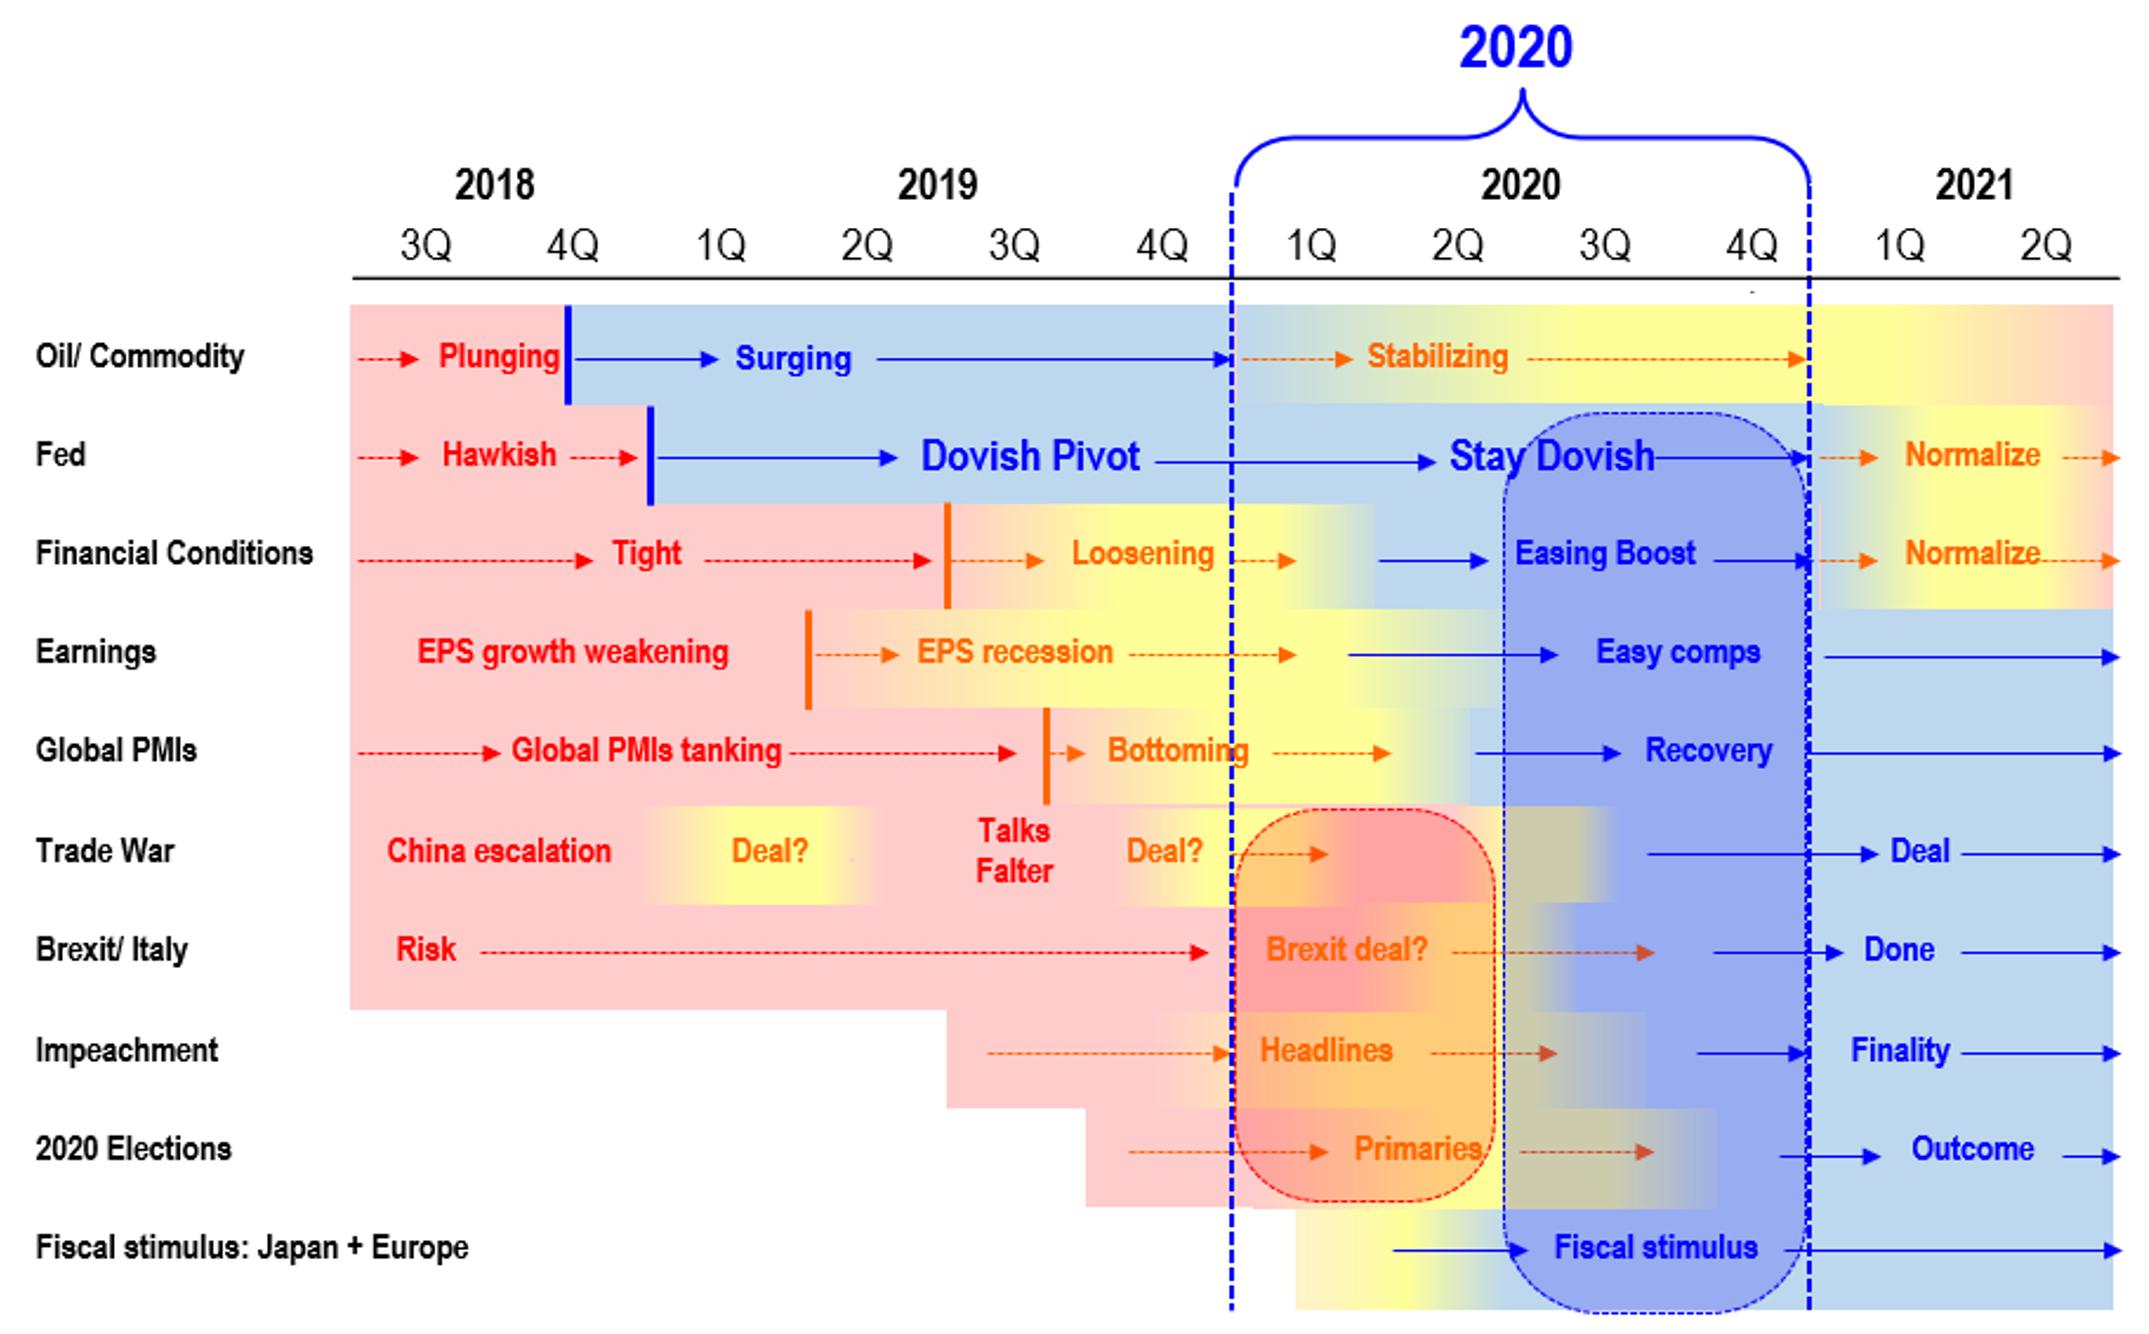 202005233 Progress in the COVID 19 Battle; Opportunity in Epicenter Stocks